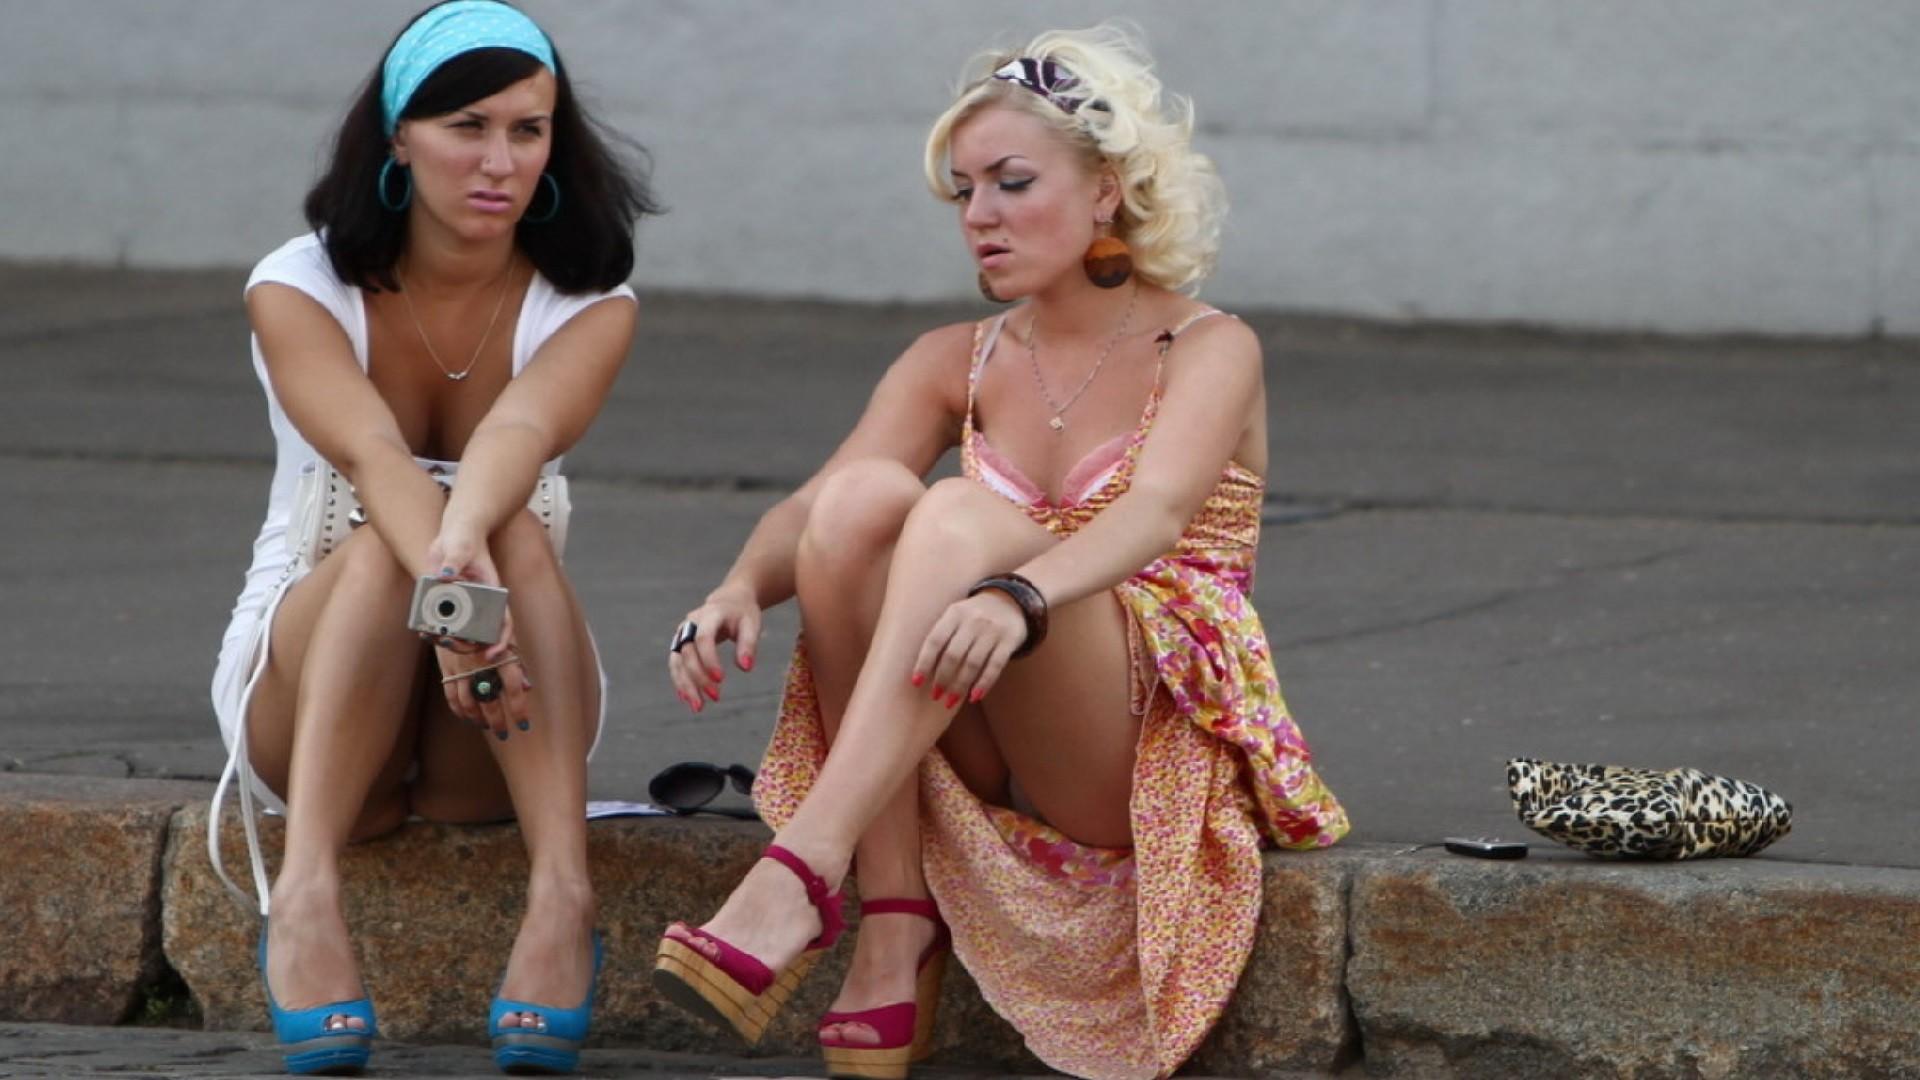 Брюнетка и блондинка засветили белые трусики